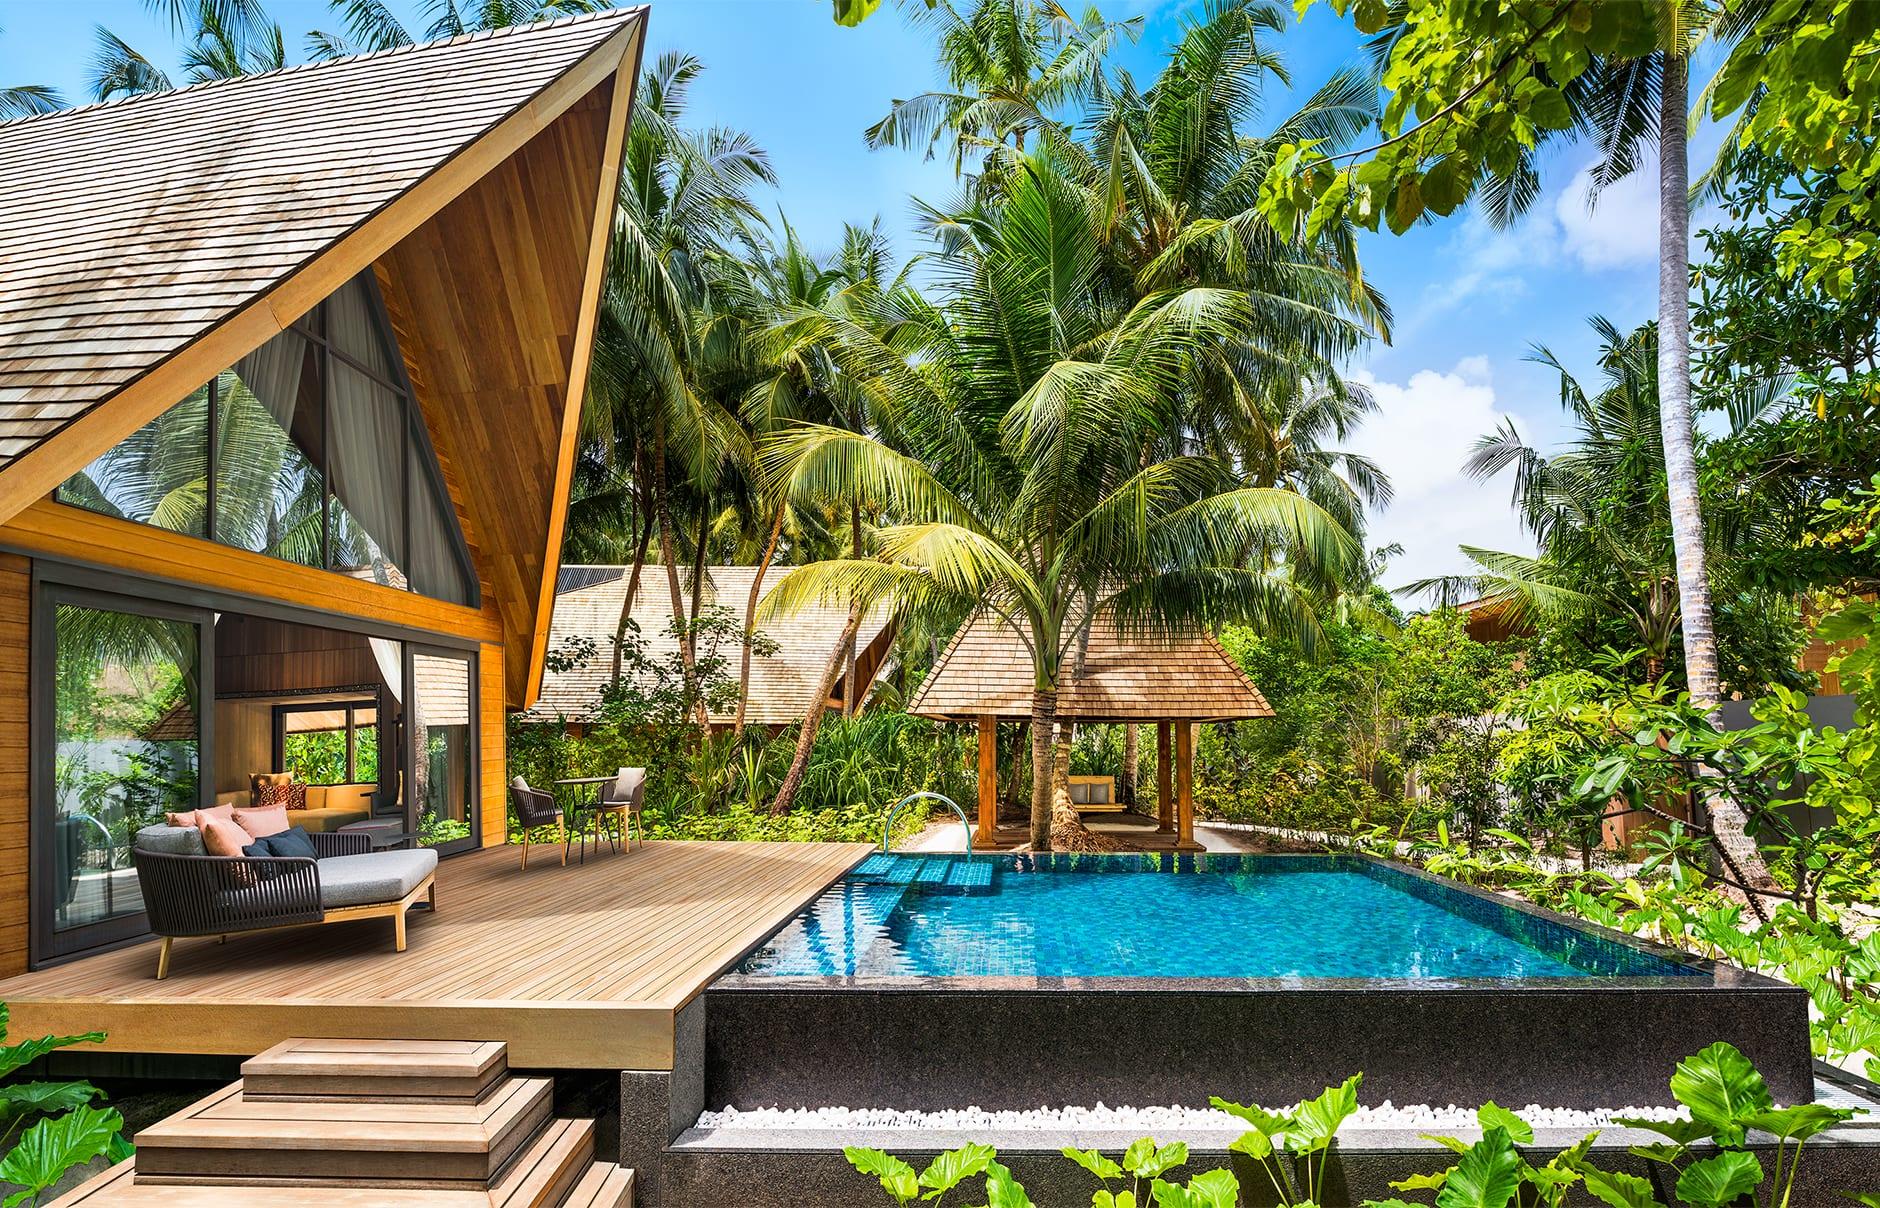 The St. Regis Maldives Vommuli Resort. © Marriott International, Inc.